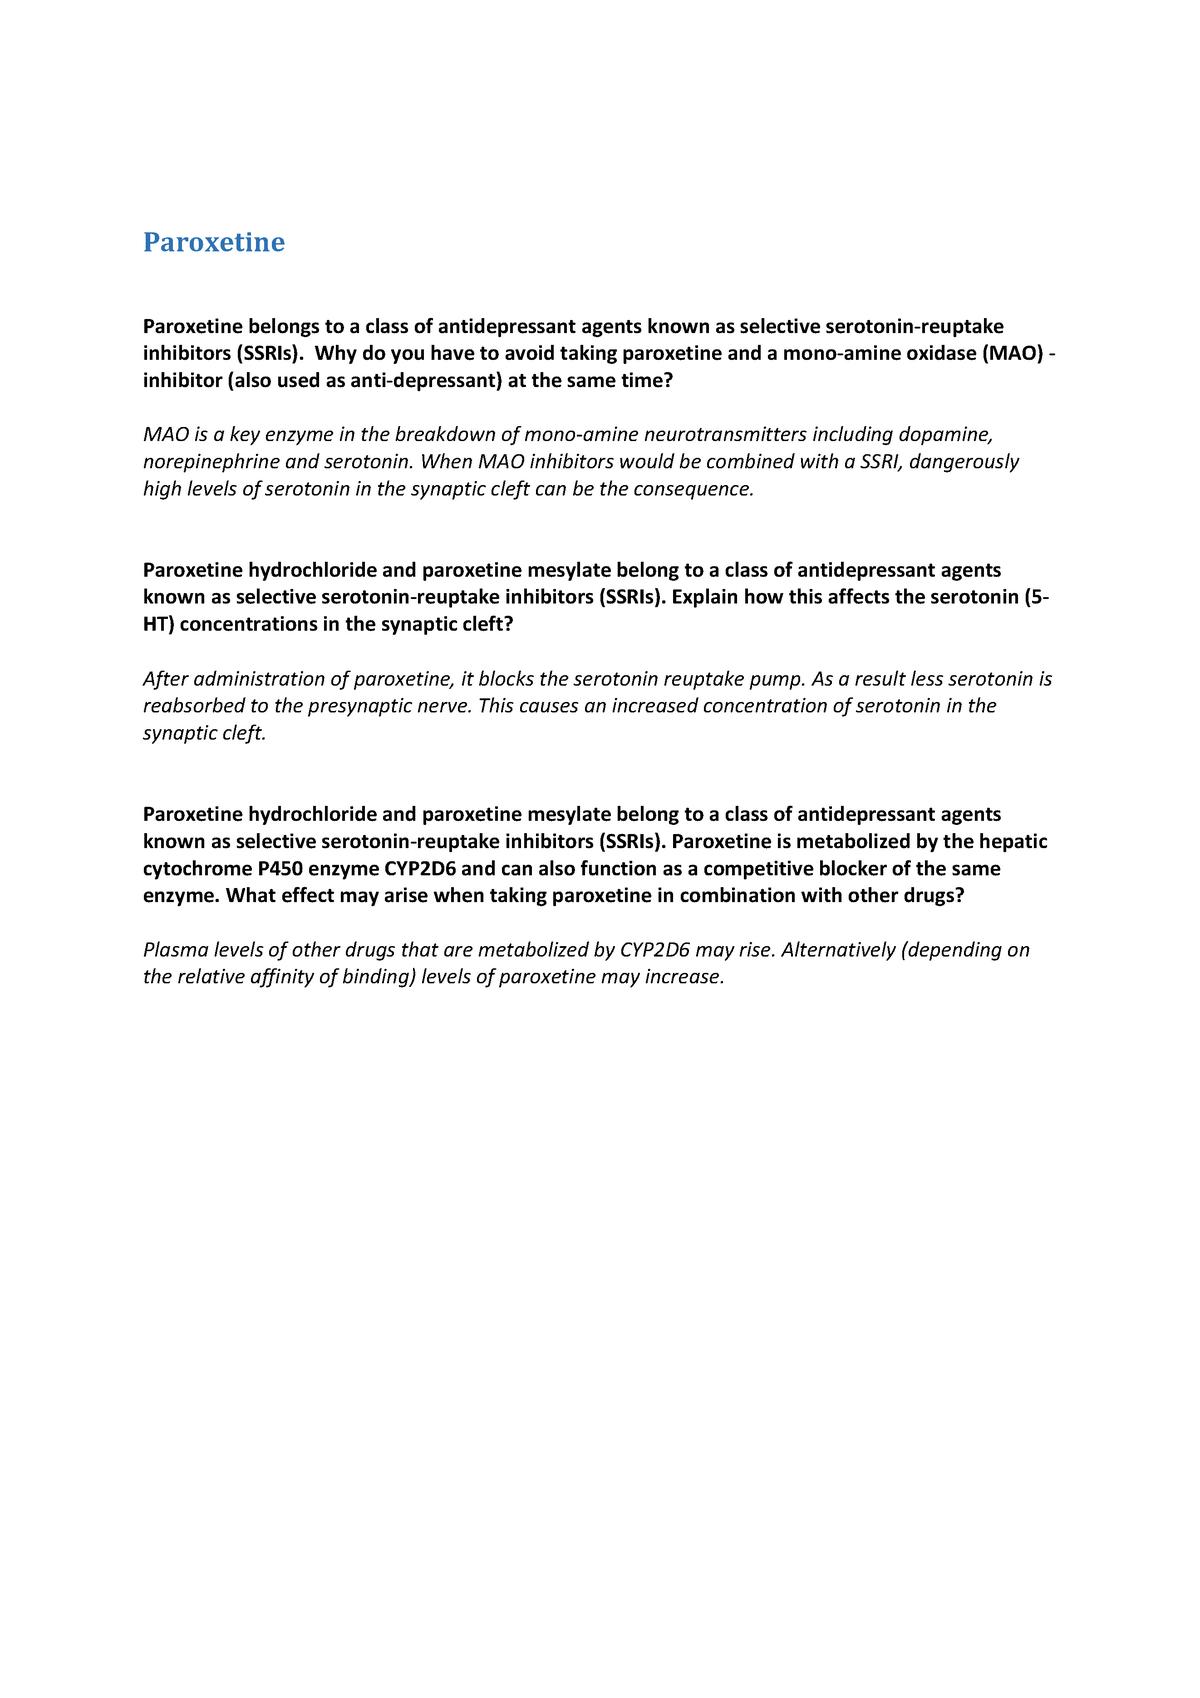 Paroxetine - vragen drugleaflet - HNE-23306: Pharmacology